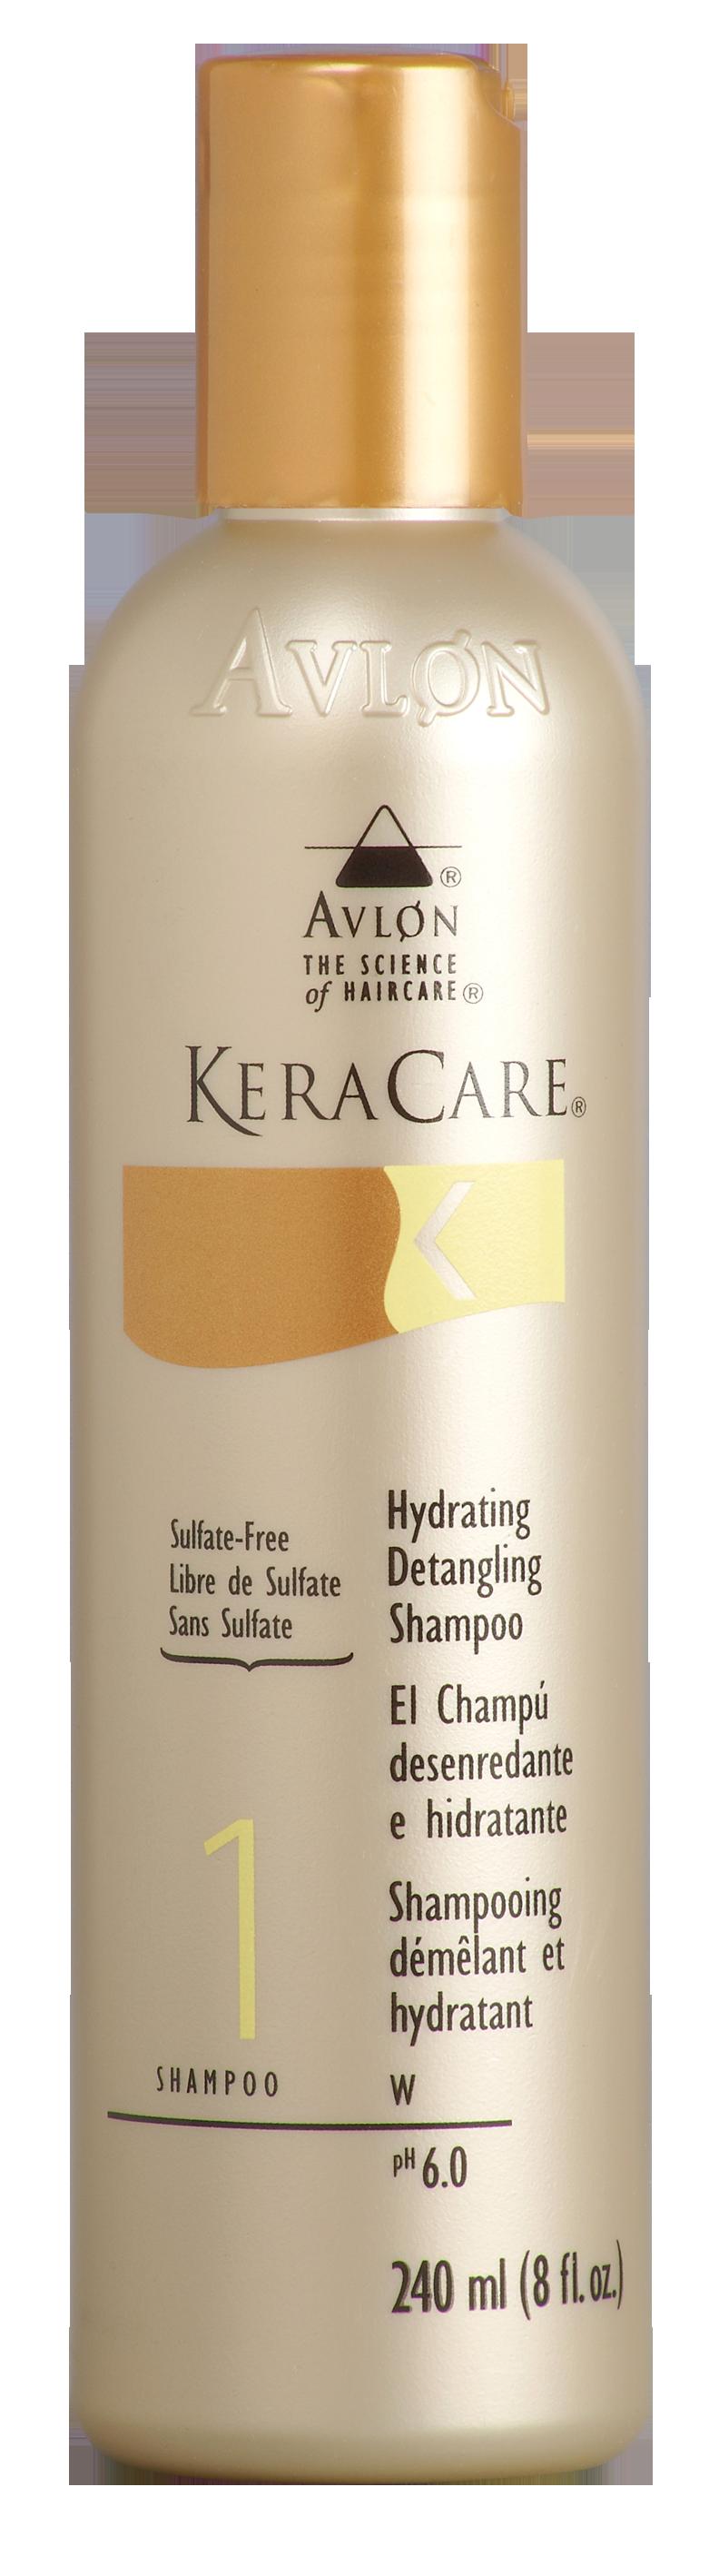 KeraCare® Hydrating& Detangling Shampoo